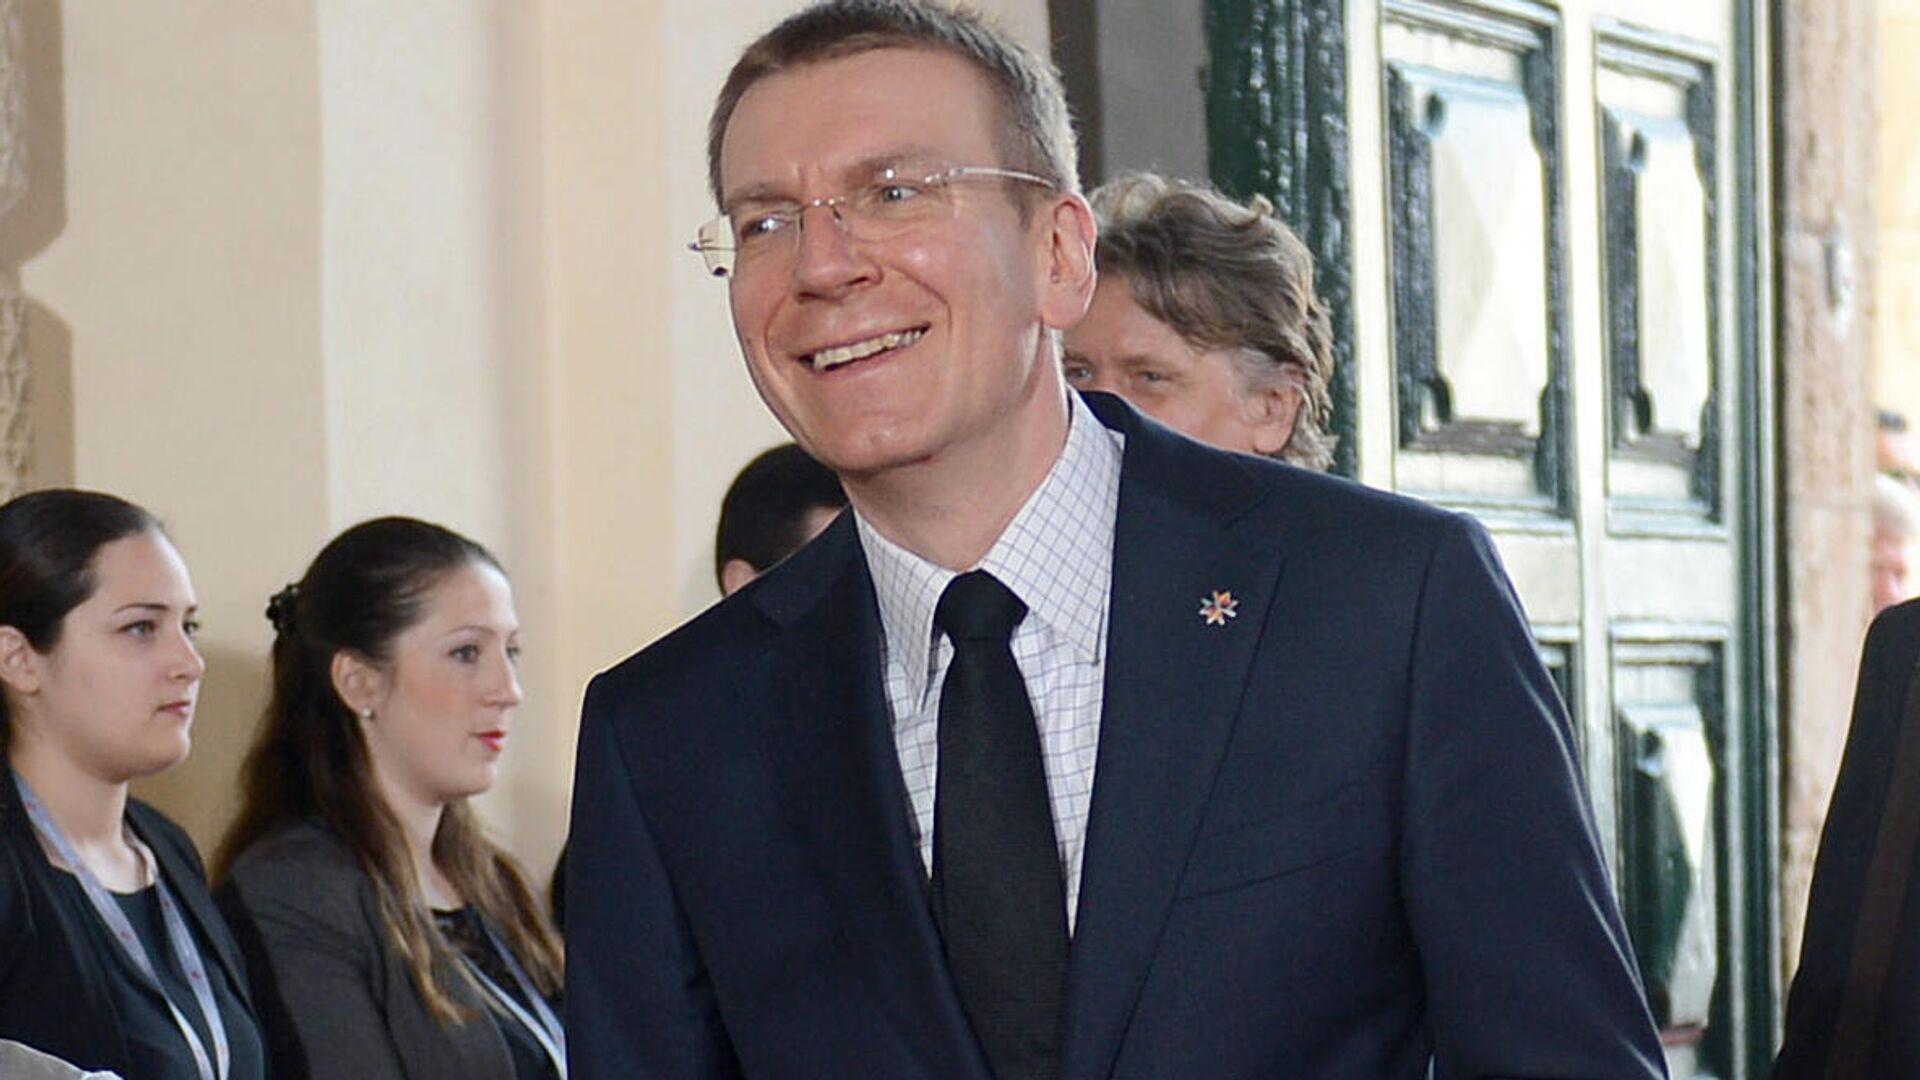 Latvijas ārlietu ministrs Edgars Rinkēvičs - Sputnik Latvija, 1920, 21.08.2021